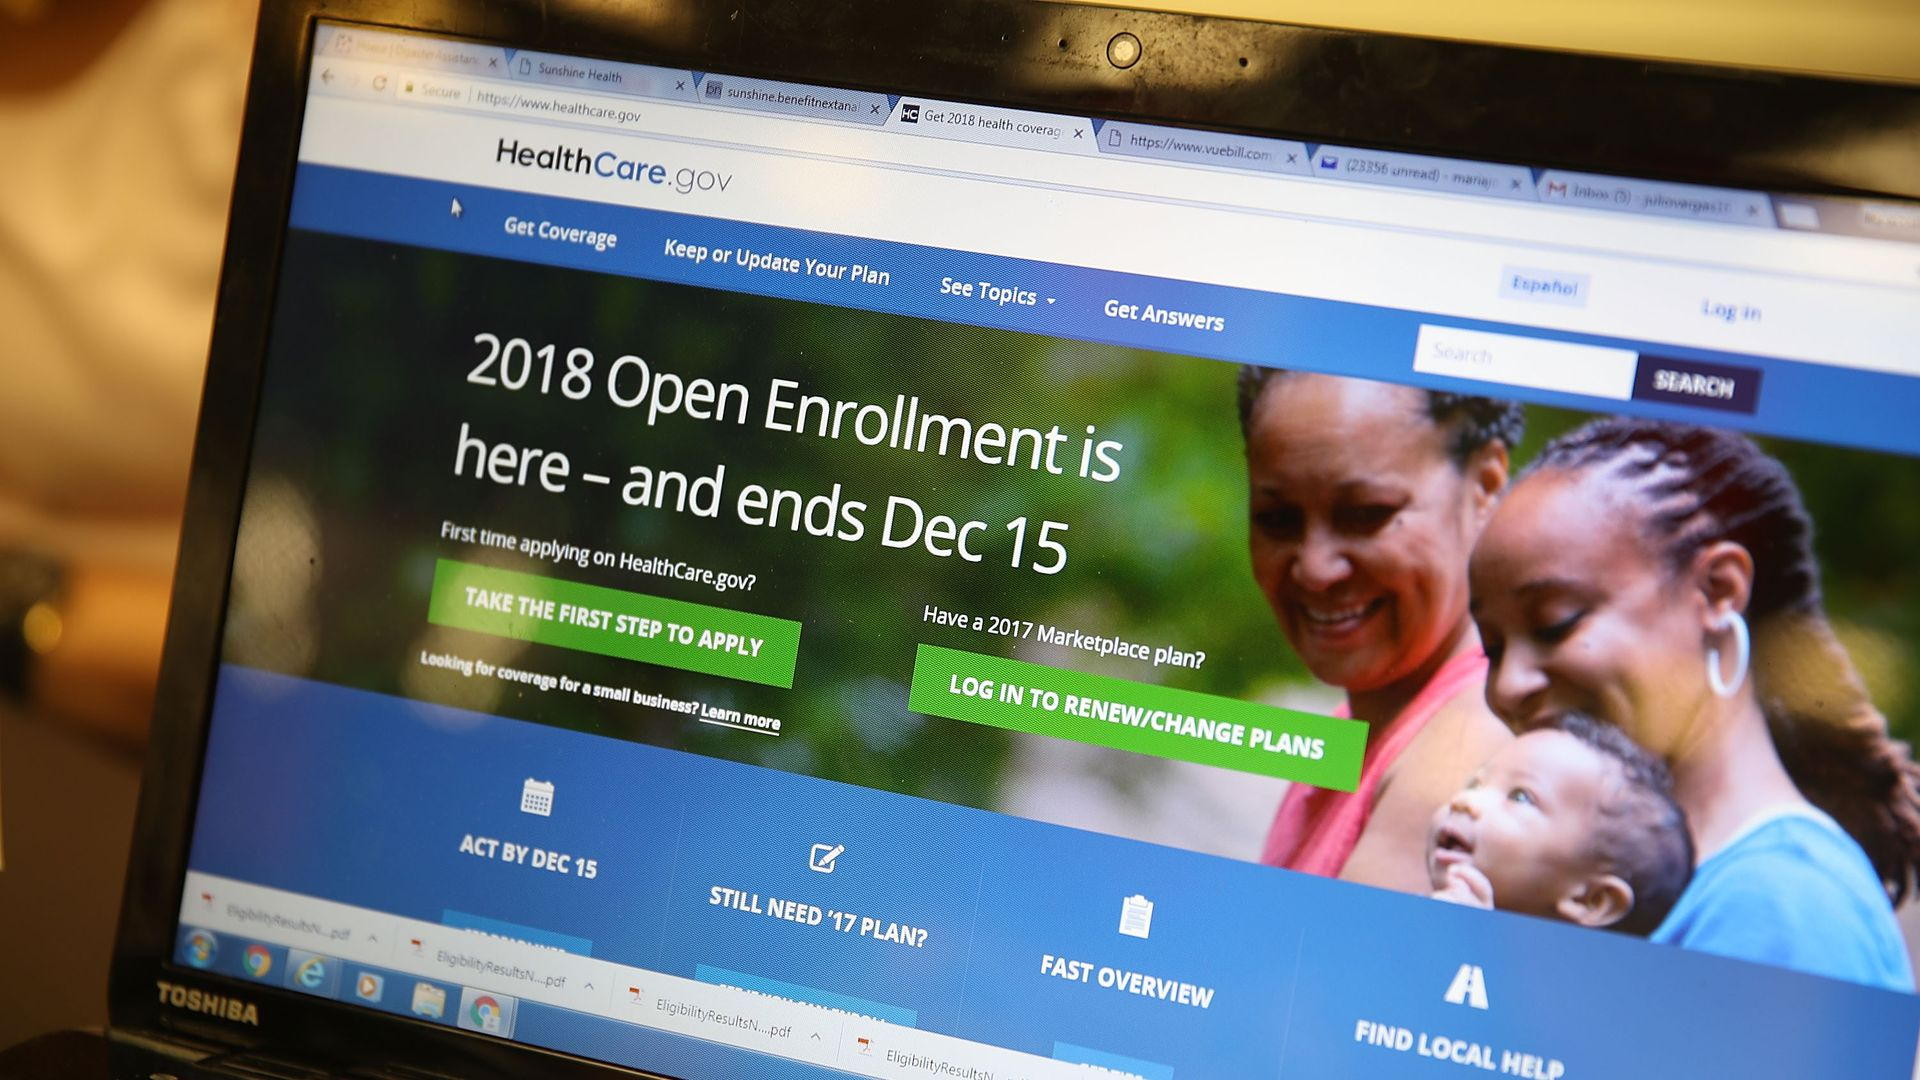 A laptop open to HealthCare.gov